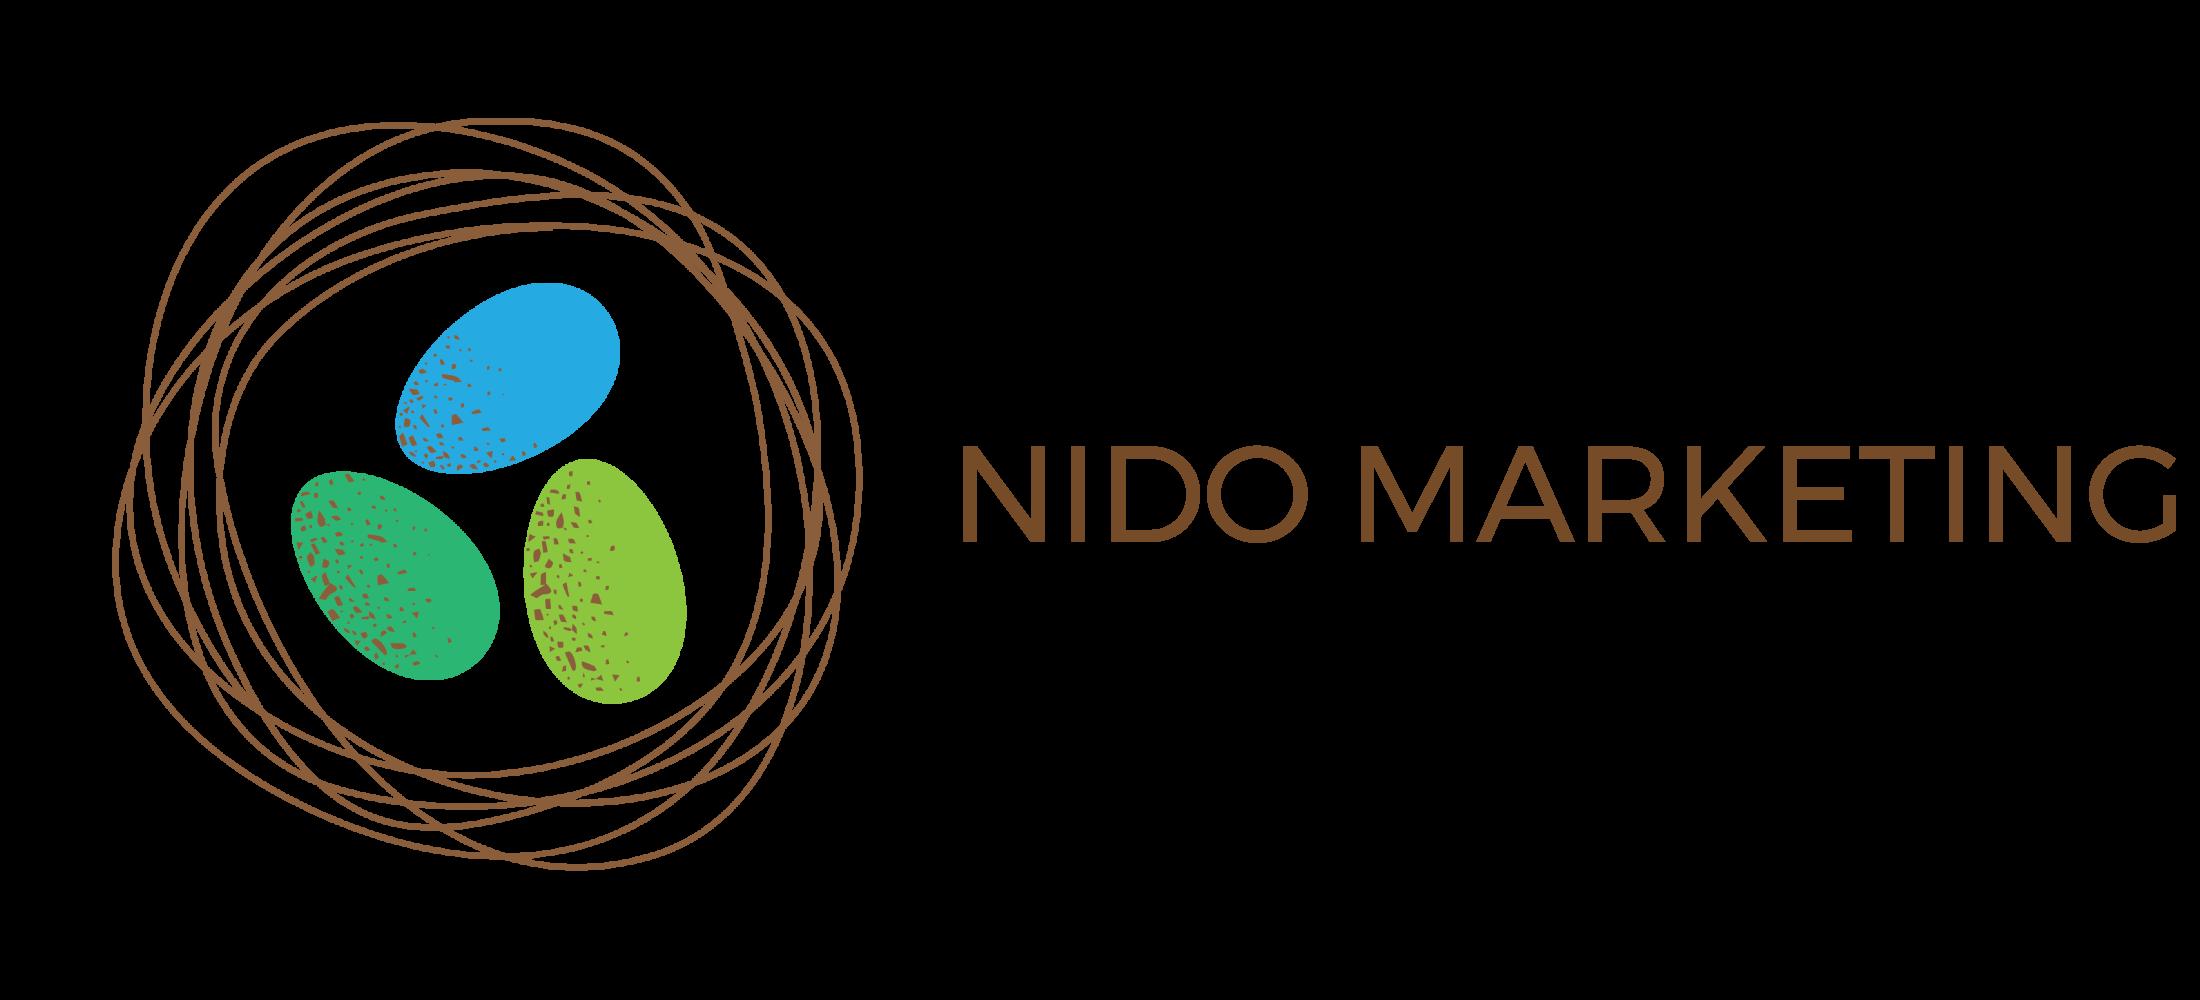 Nido Marketing logo